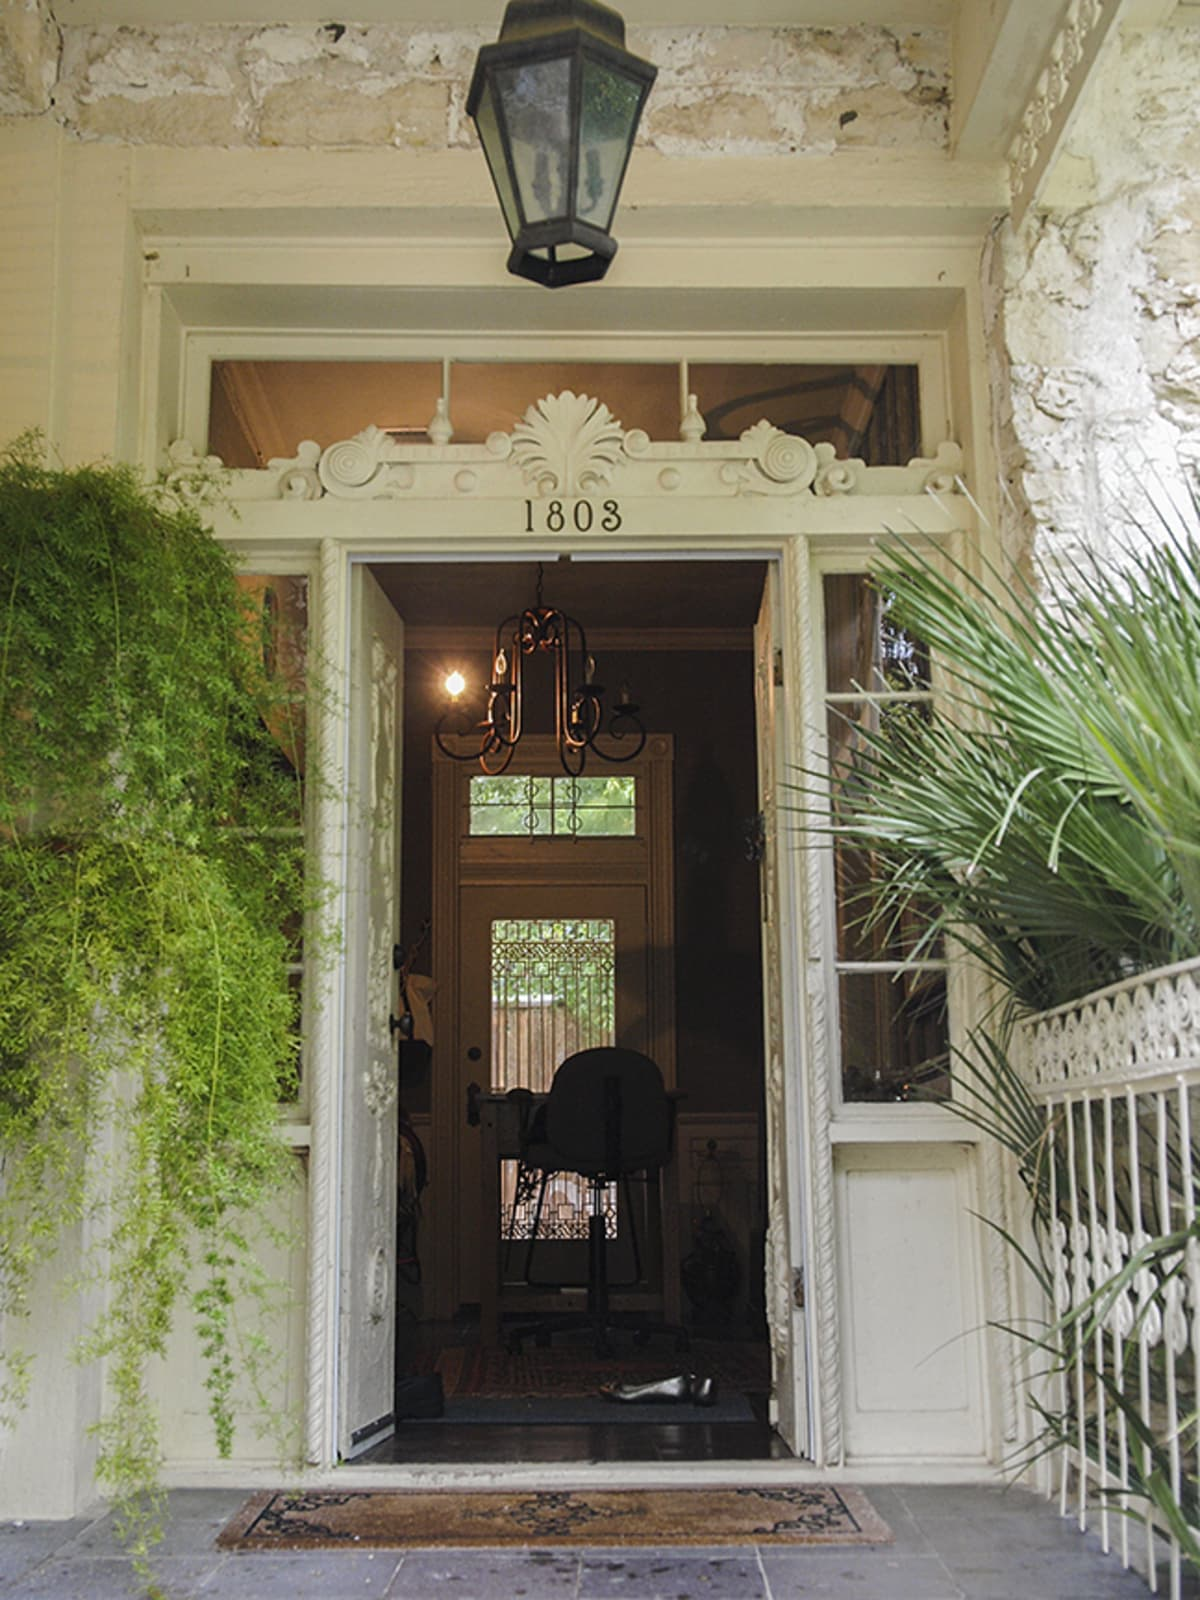 Preservation Austin Historic Homes Tour 2017 1803 Evergreen Avenue